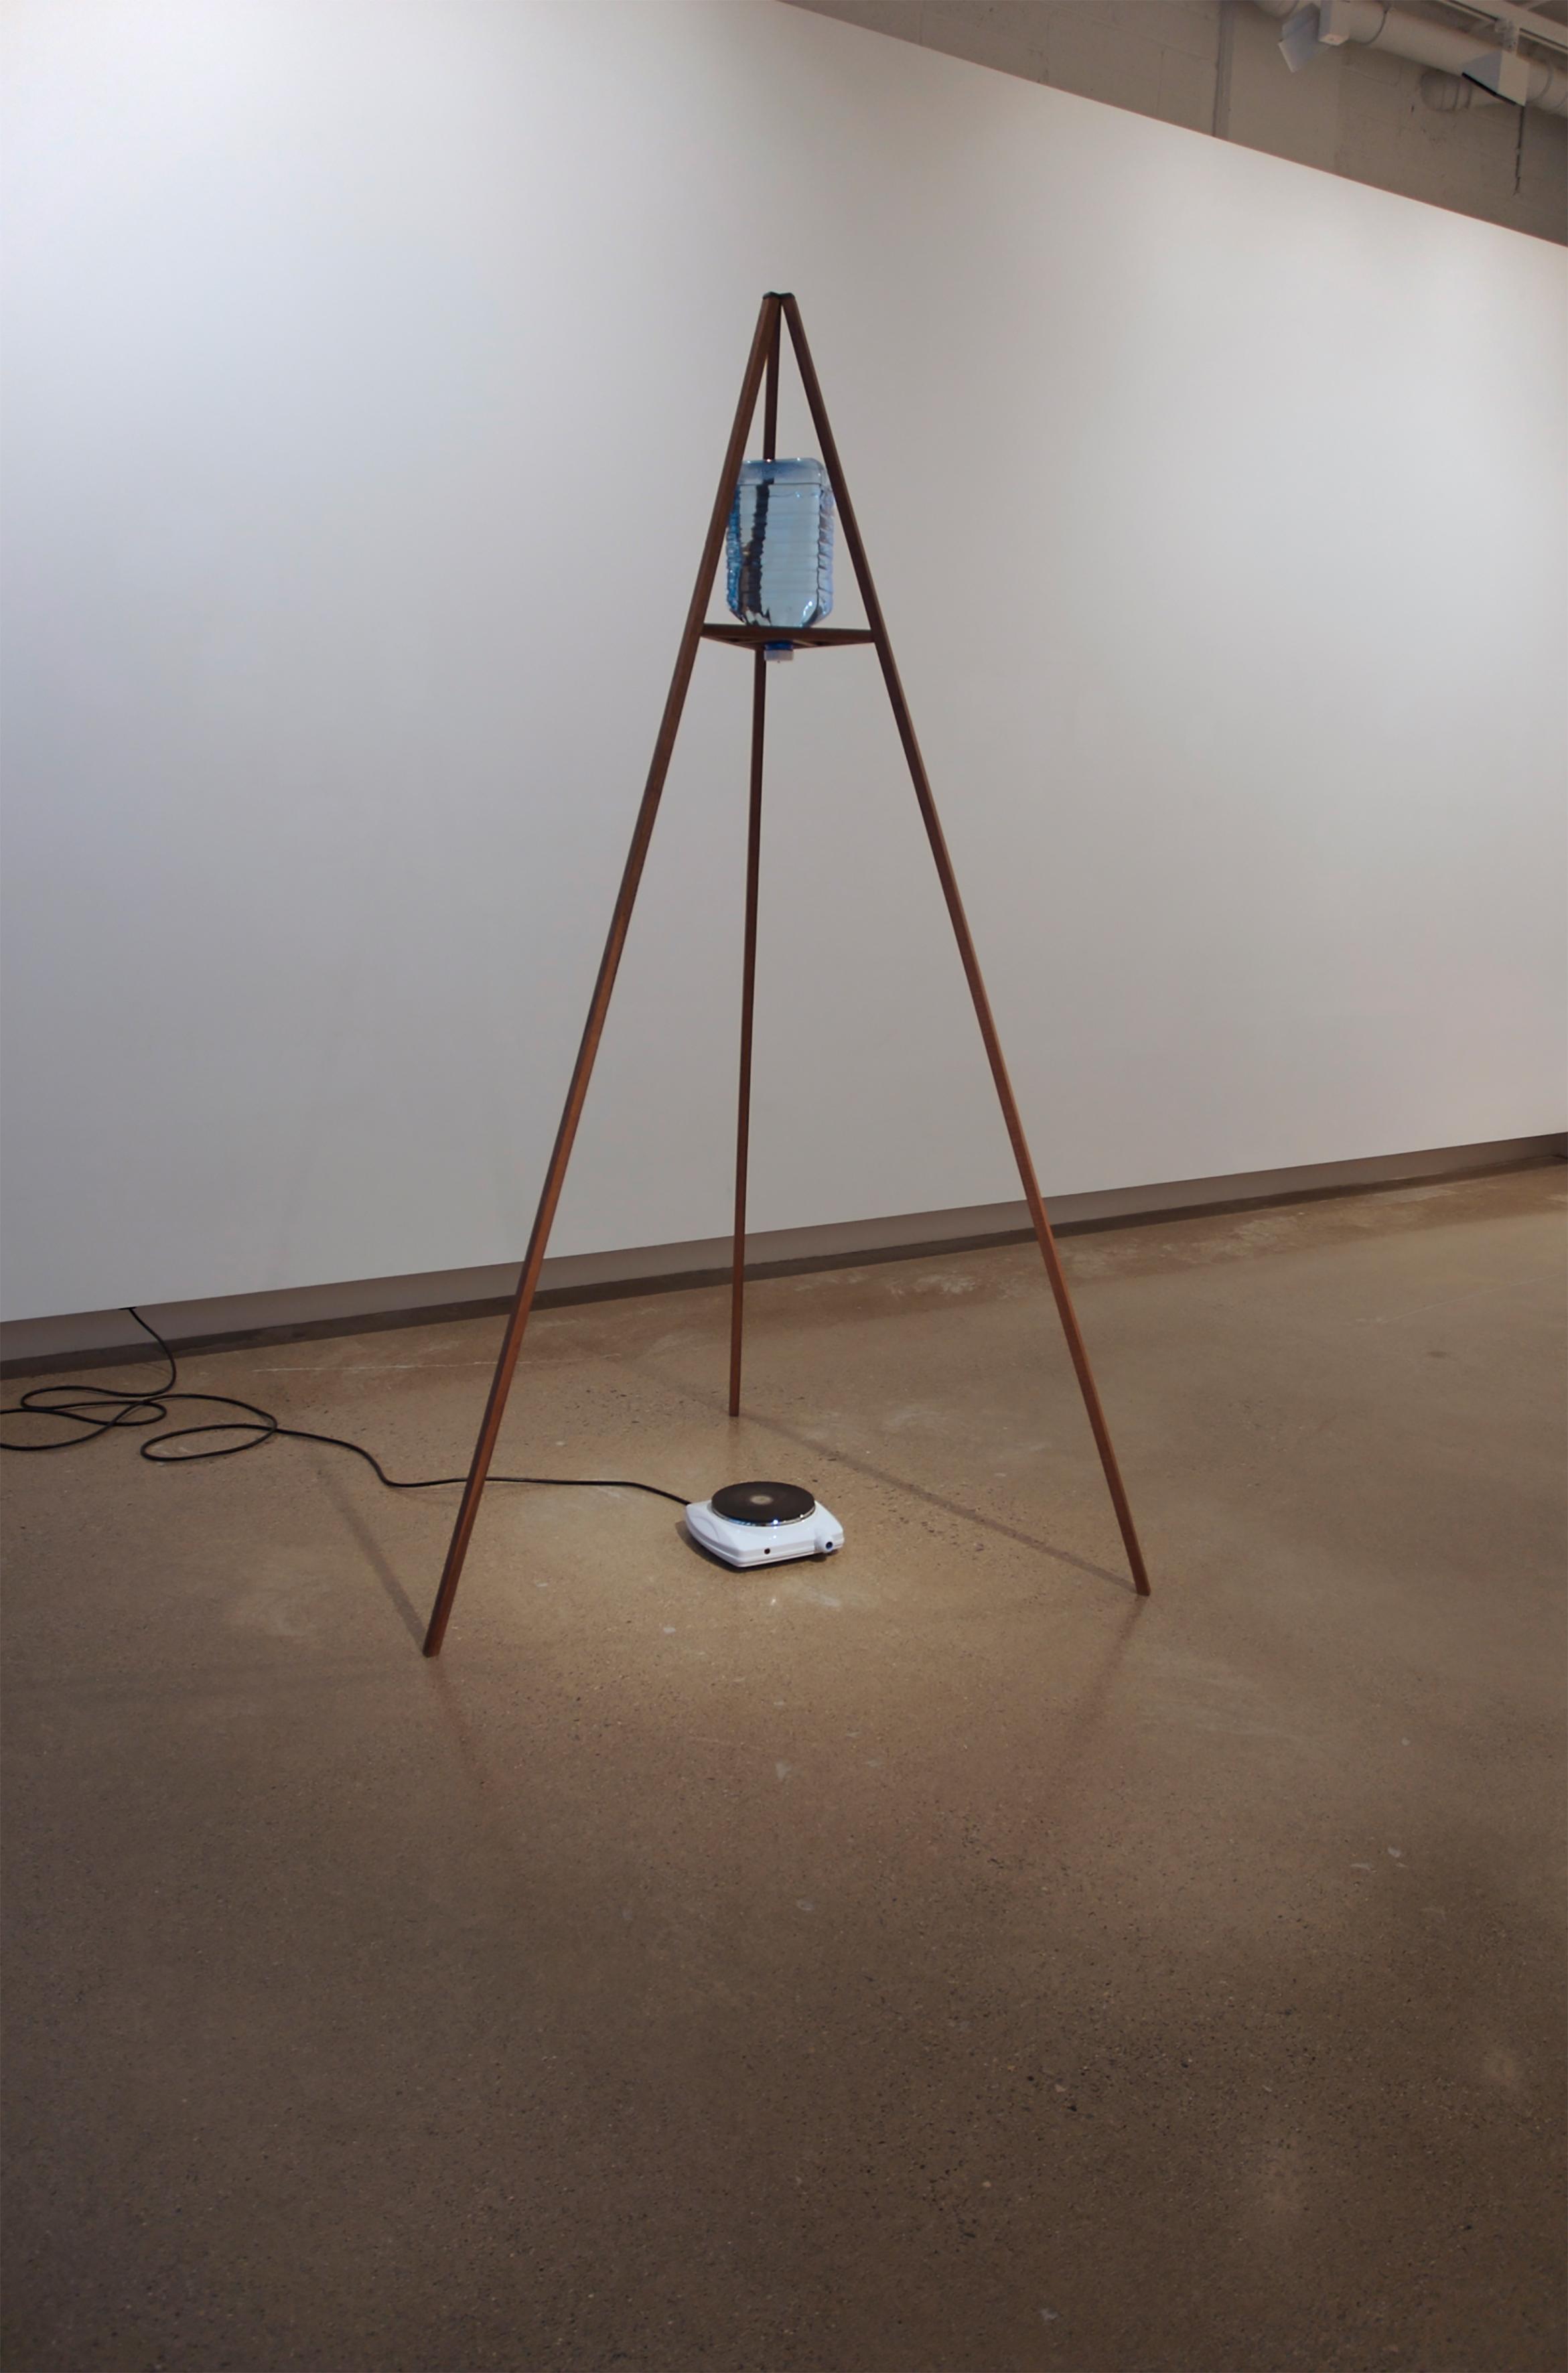 David Beattie, Cloud Maker, 2009/2010